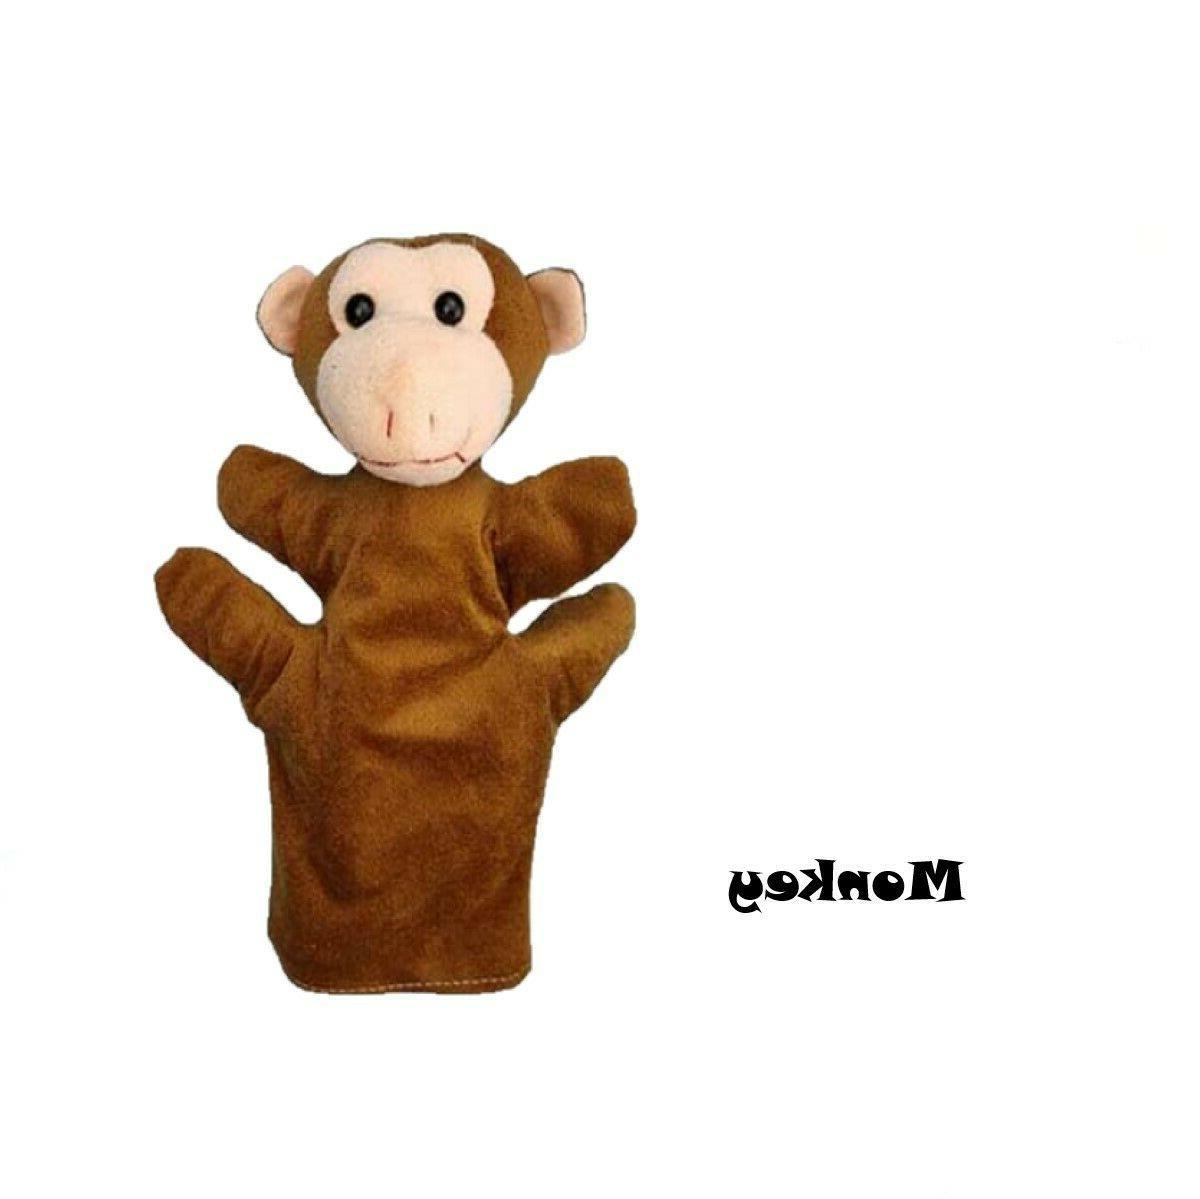 "Animal Puppets Plush 9.2"" 6"